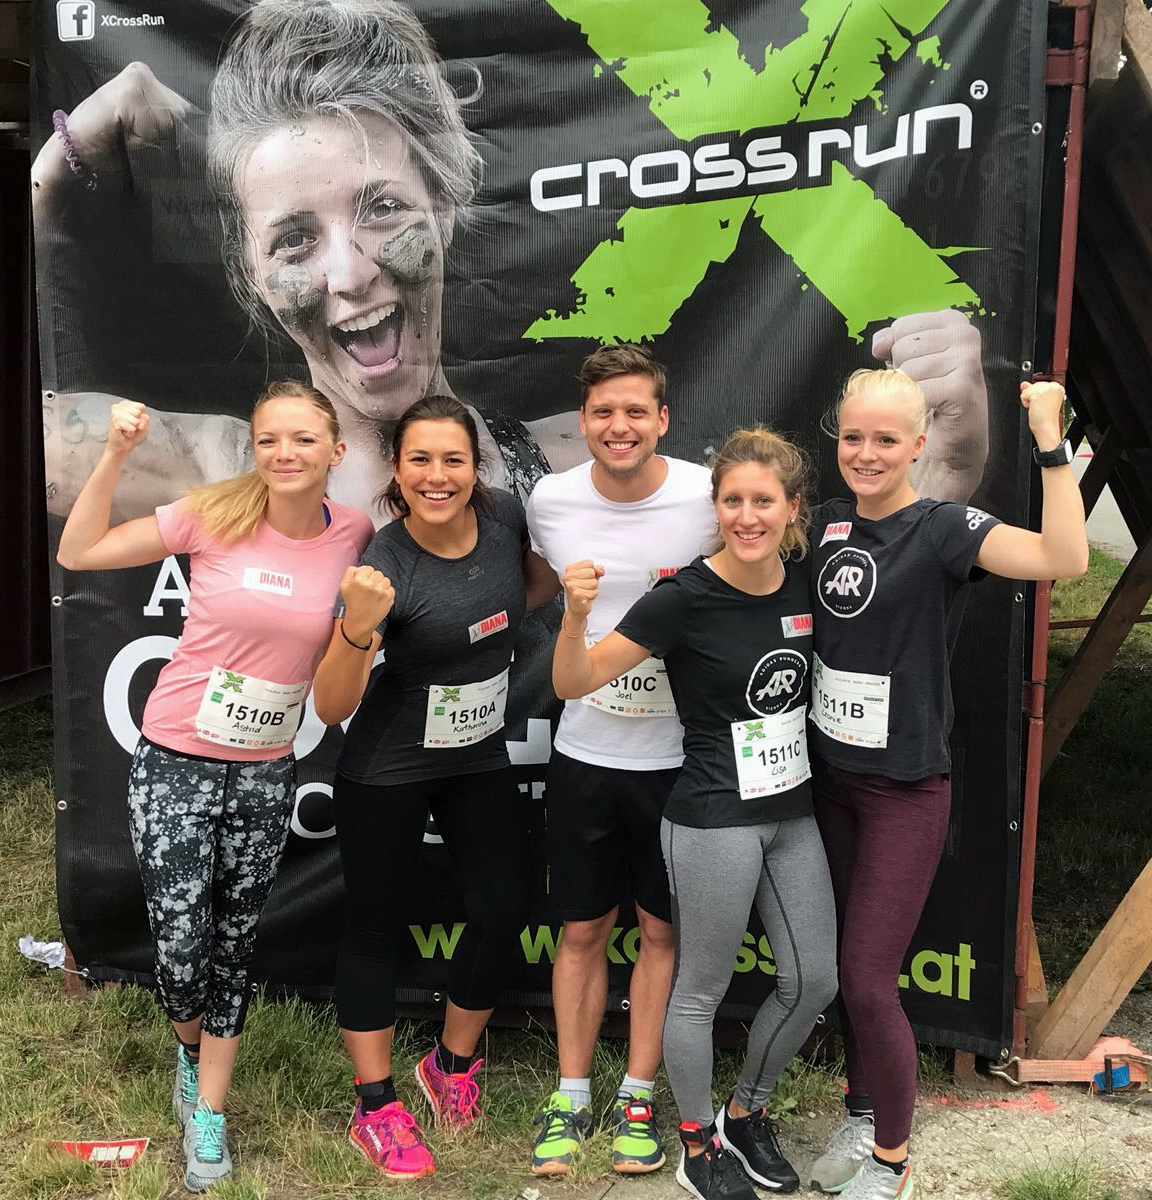 X-Cross Run 2018